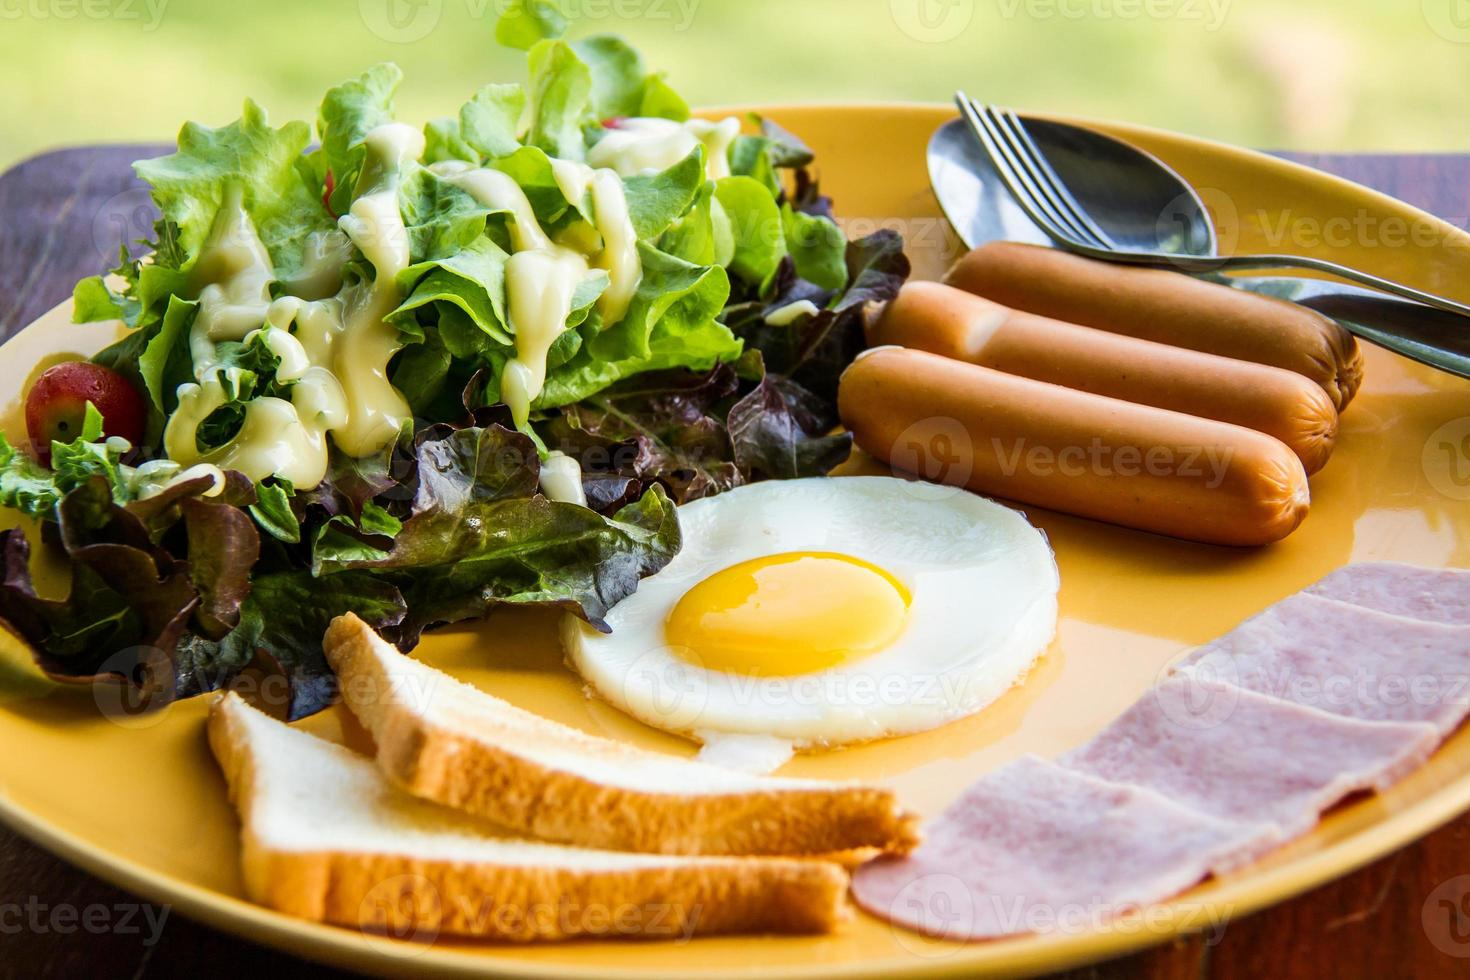 breakfast  consists eeg,salad,bread,bacon and sausage photo